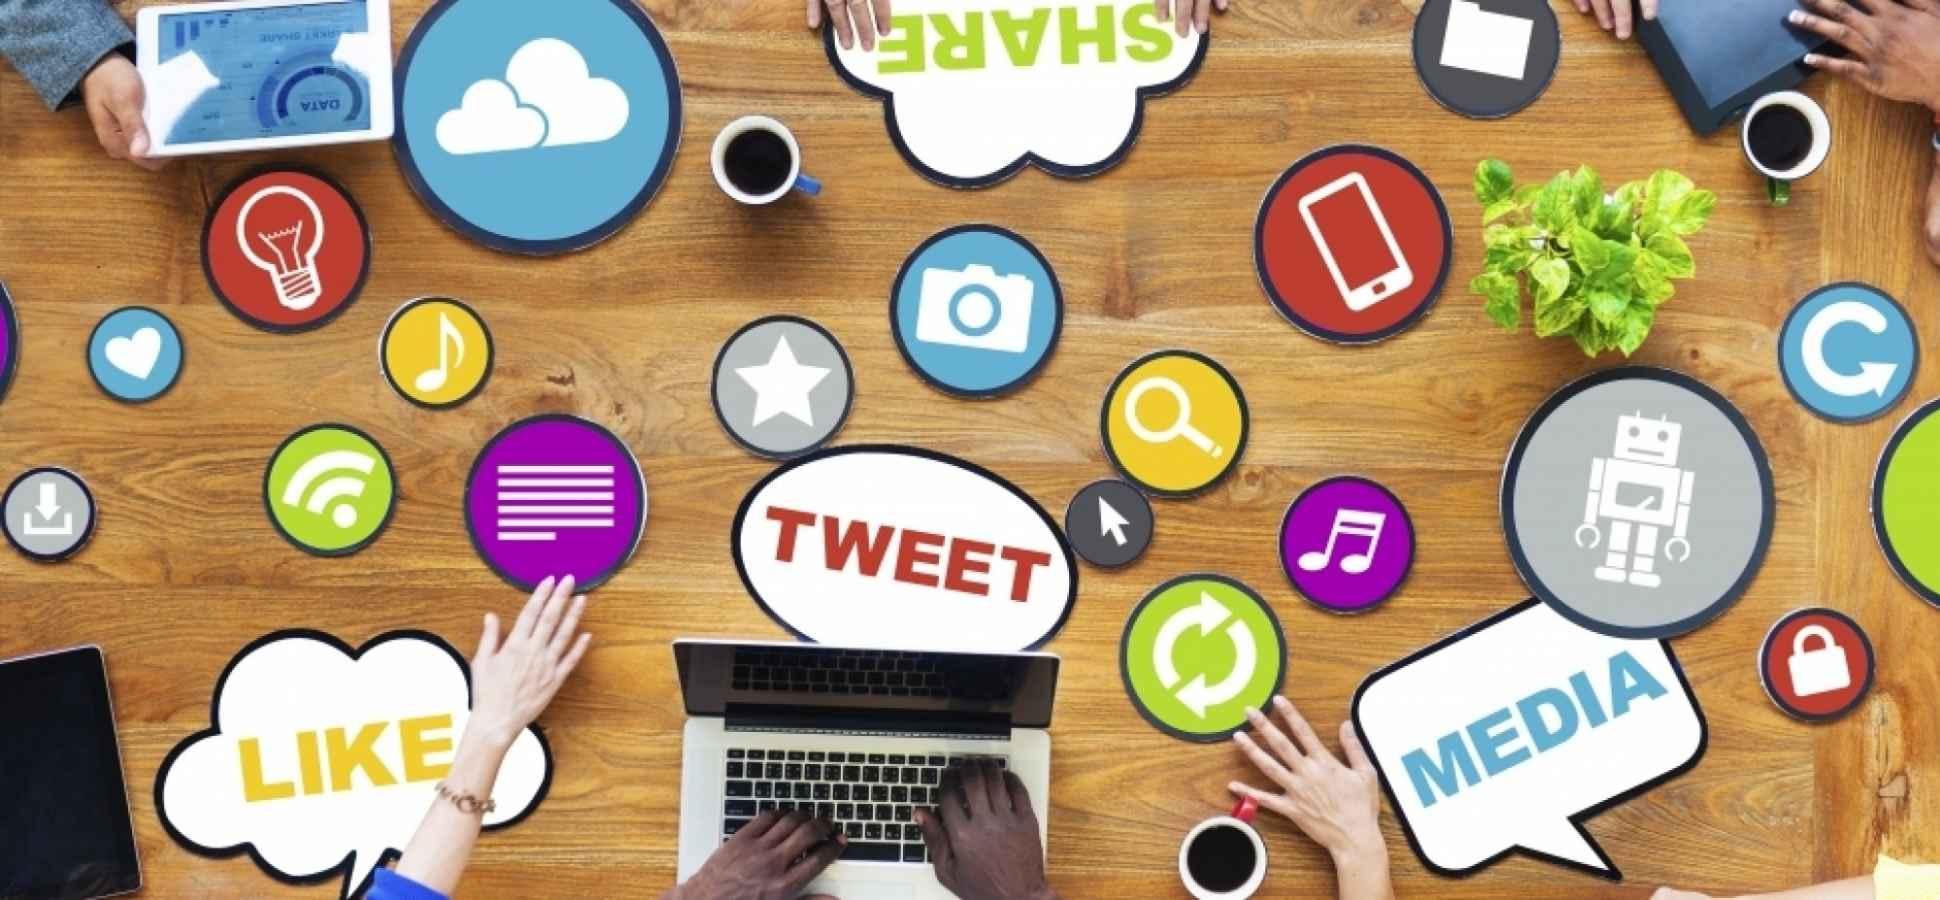 7 Social Media Myths That Cripple Marketing Campaigns